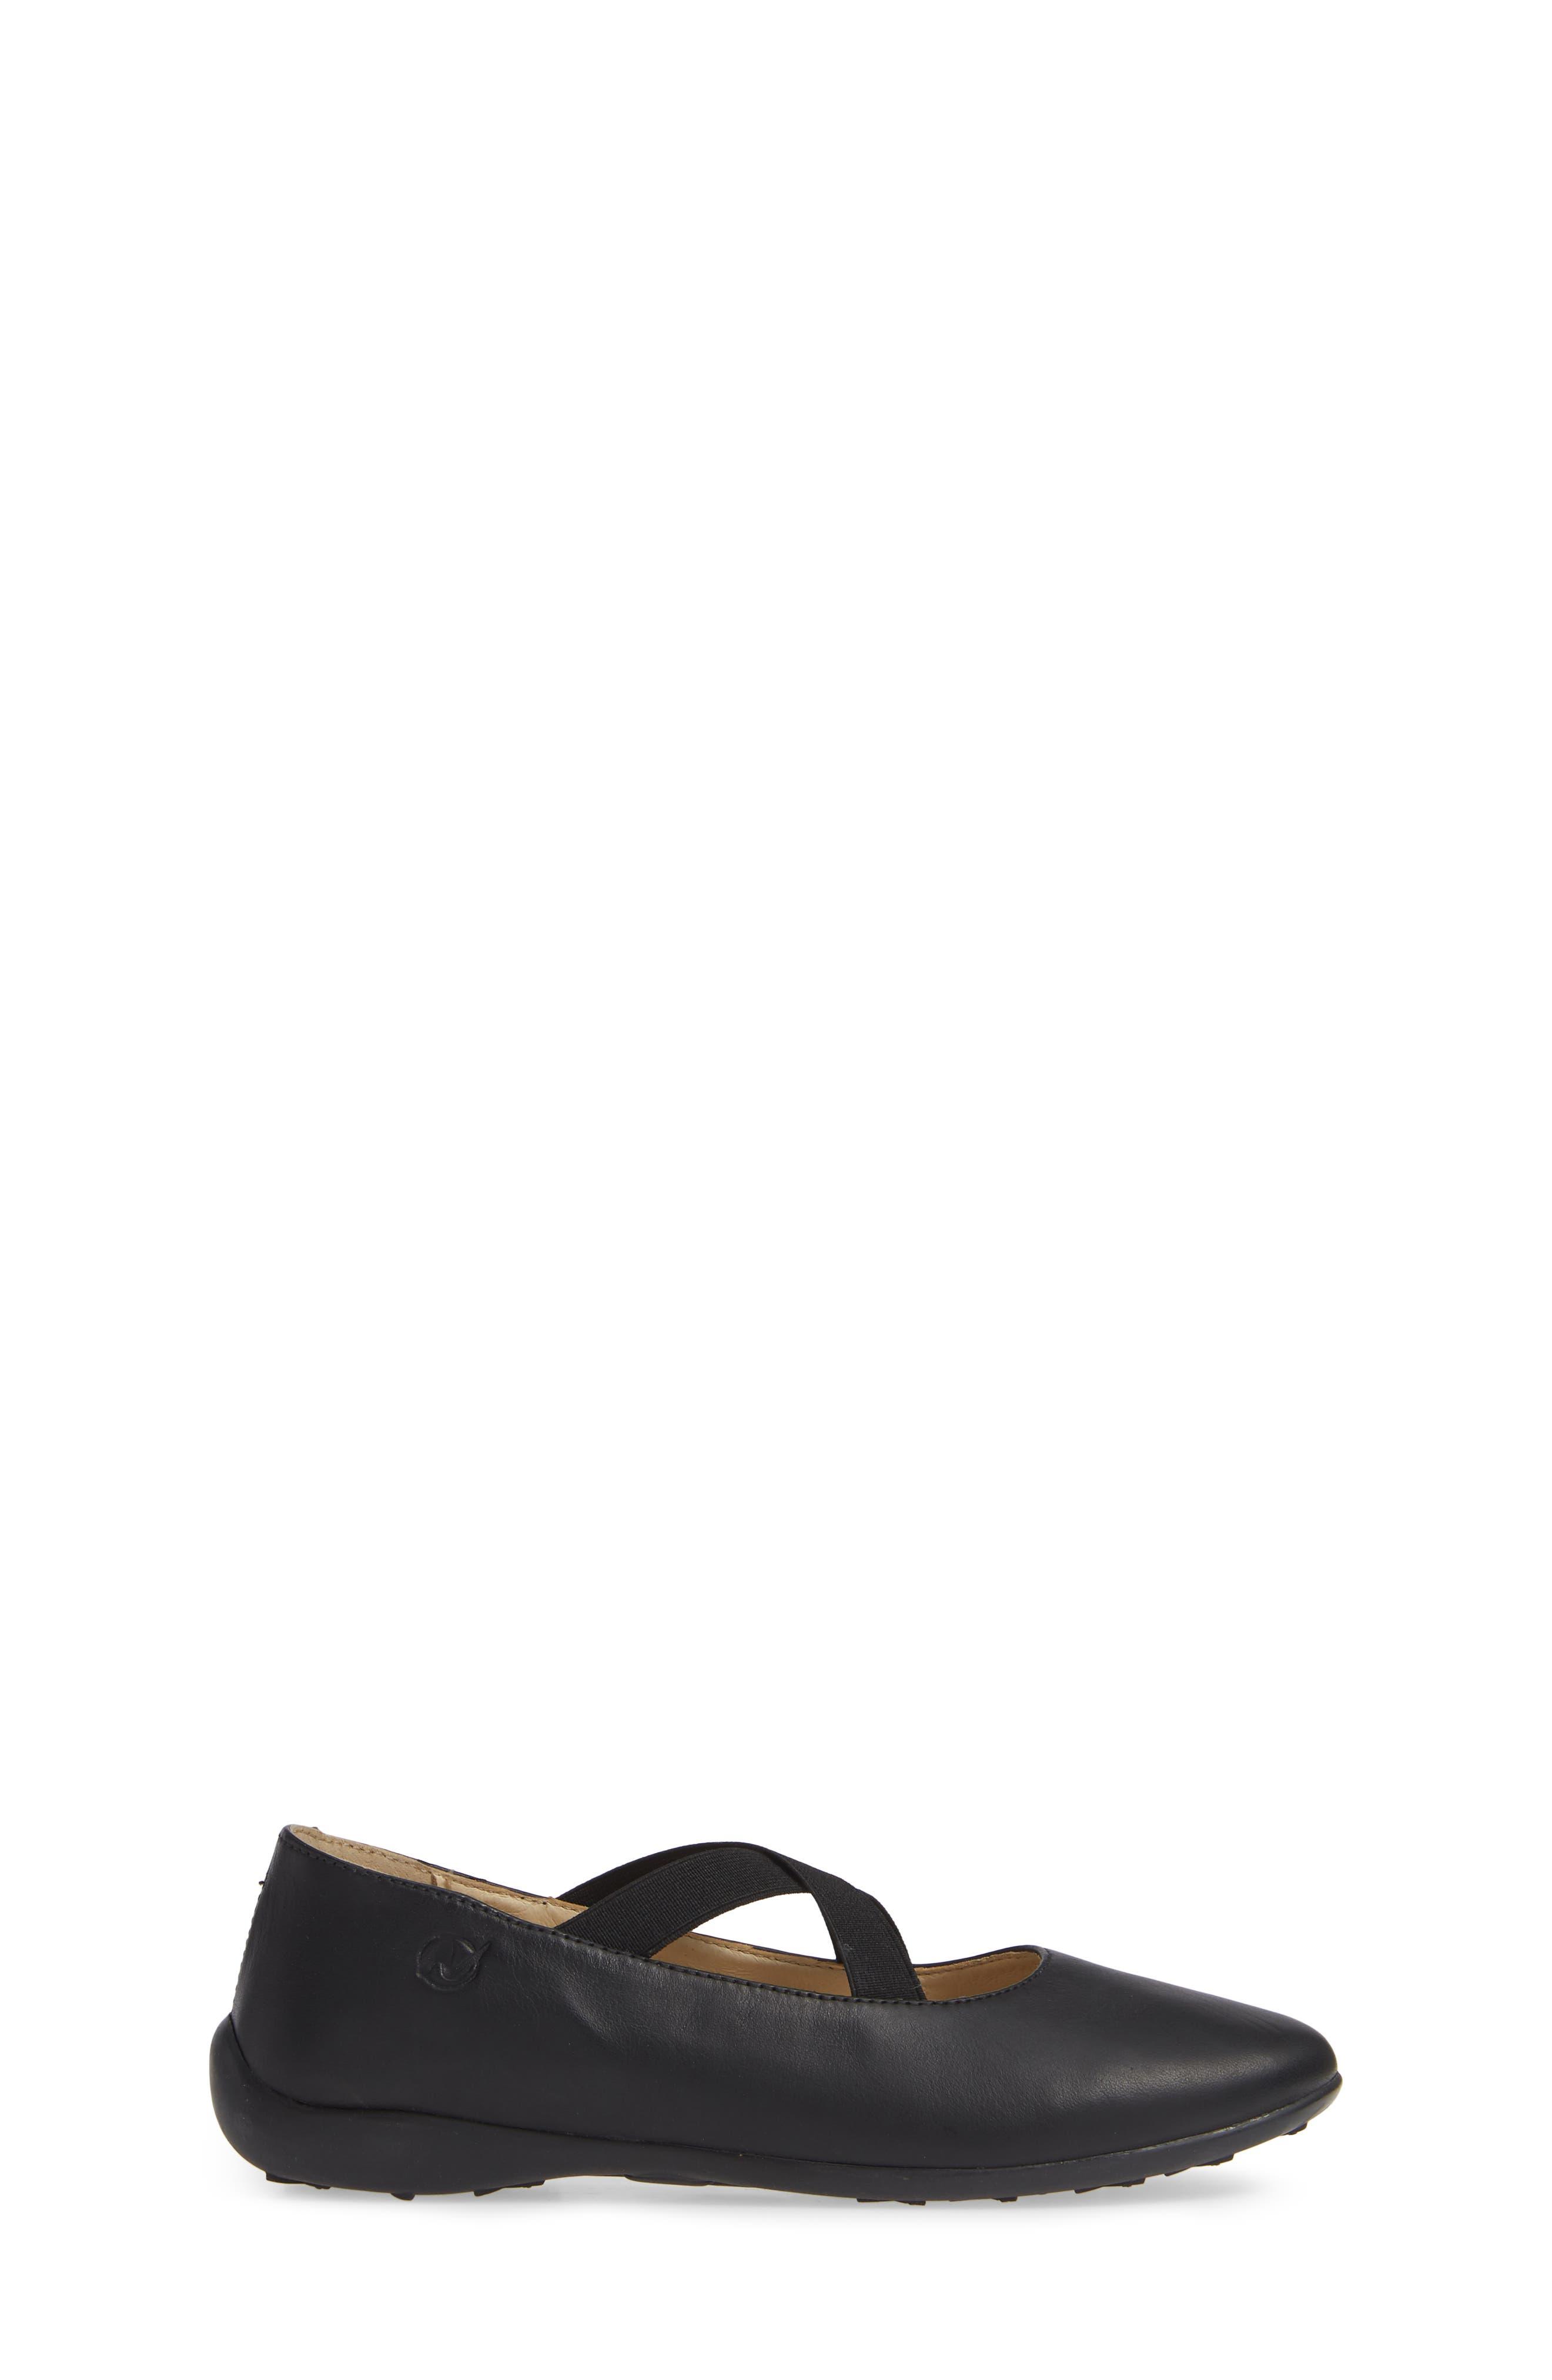 Matera Ballet Flat,                             Alternate thumbnail 4, color,                             Black Leather